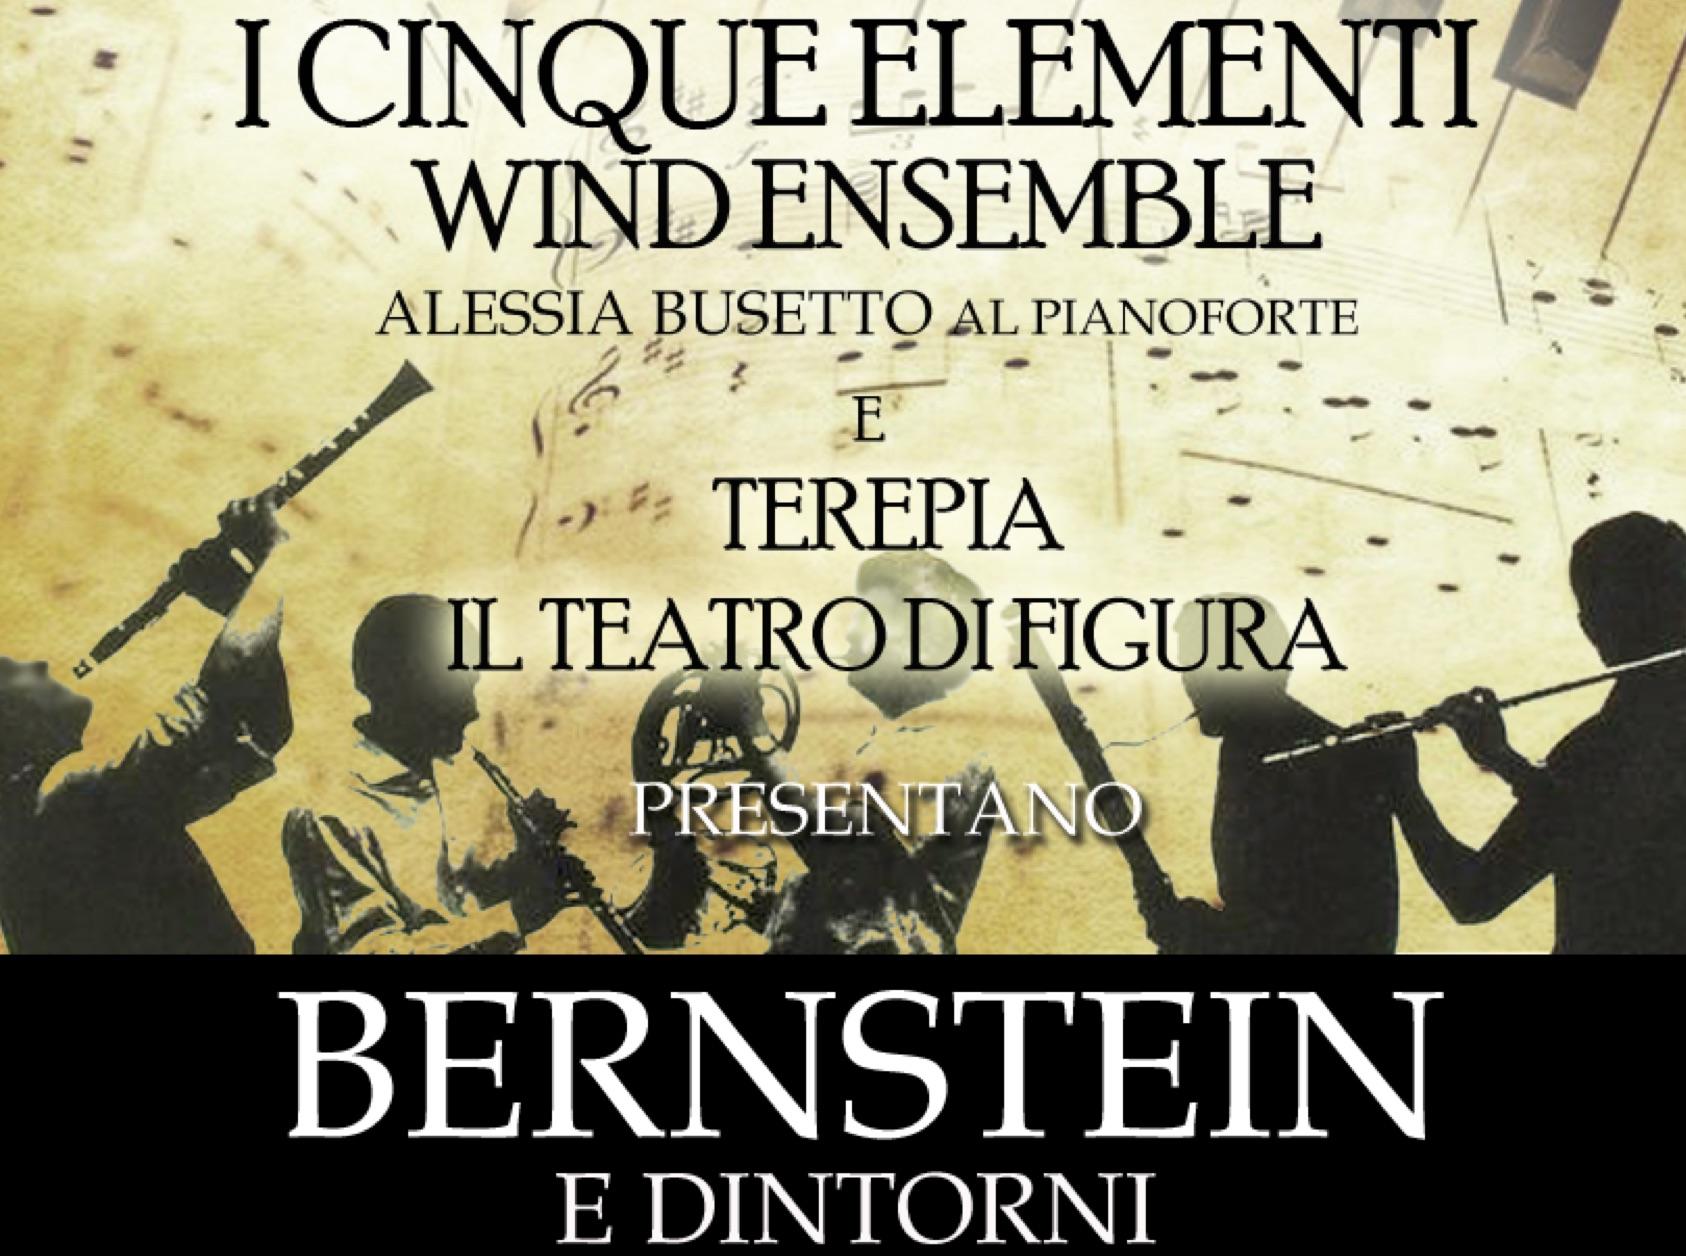 Bernstein e dintorni